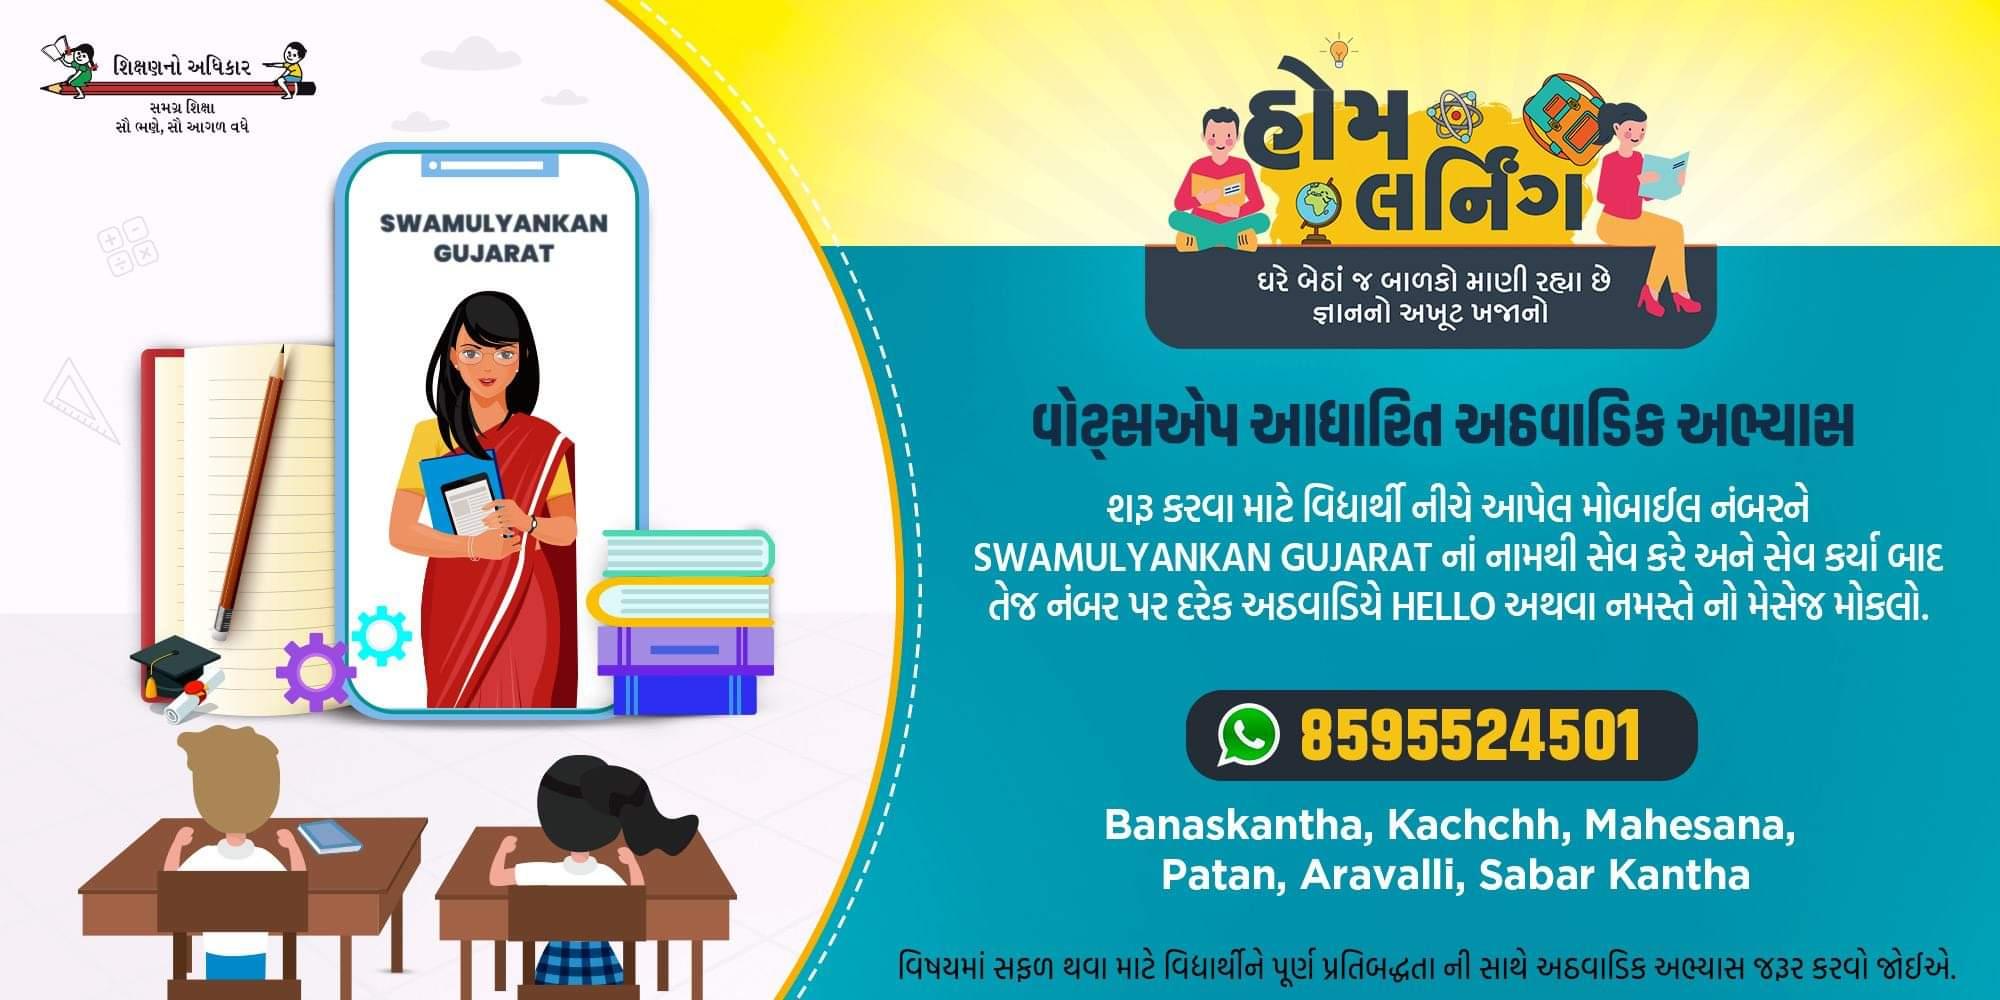 WhatsApp%2BImage%2B2021-01-29%2Bat%2B4.49.58%2BPM